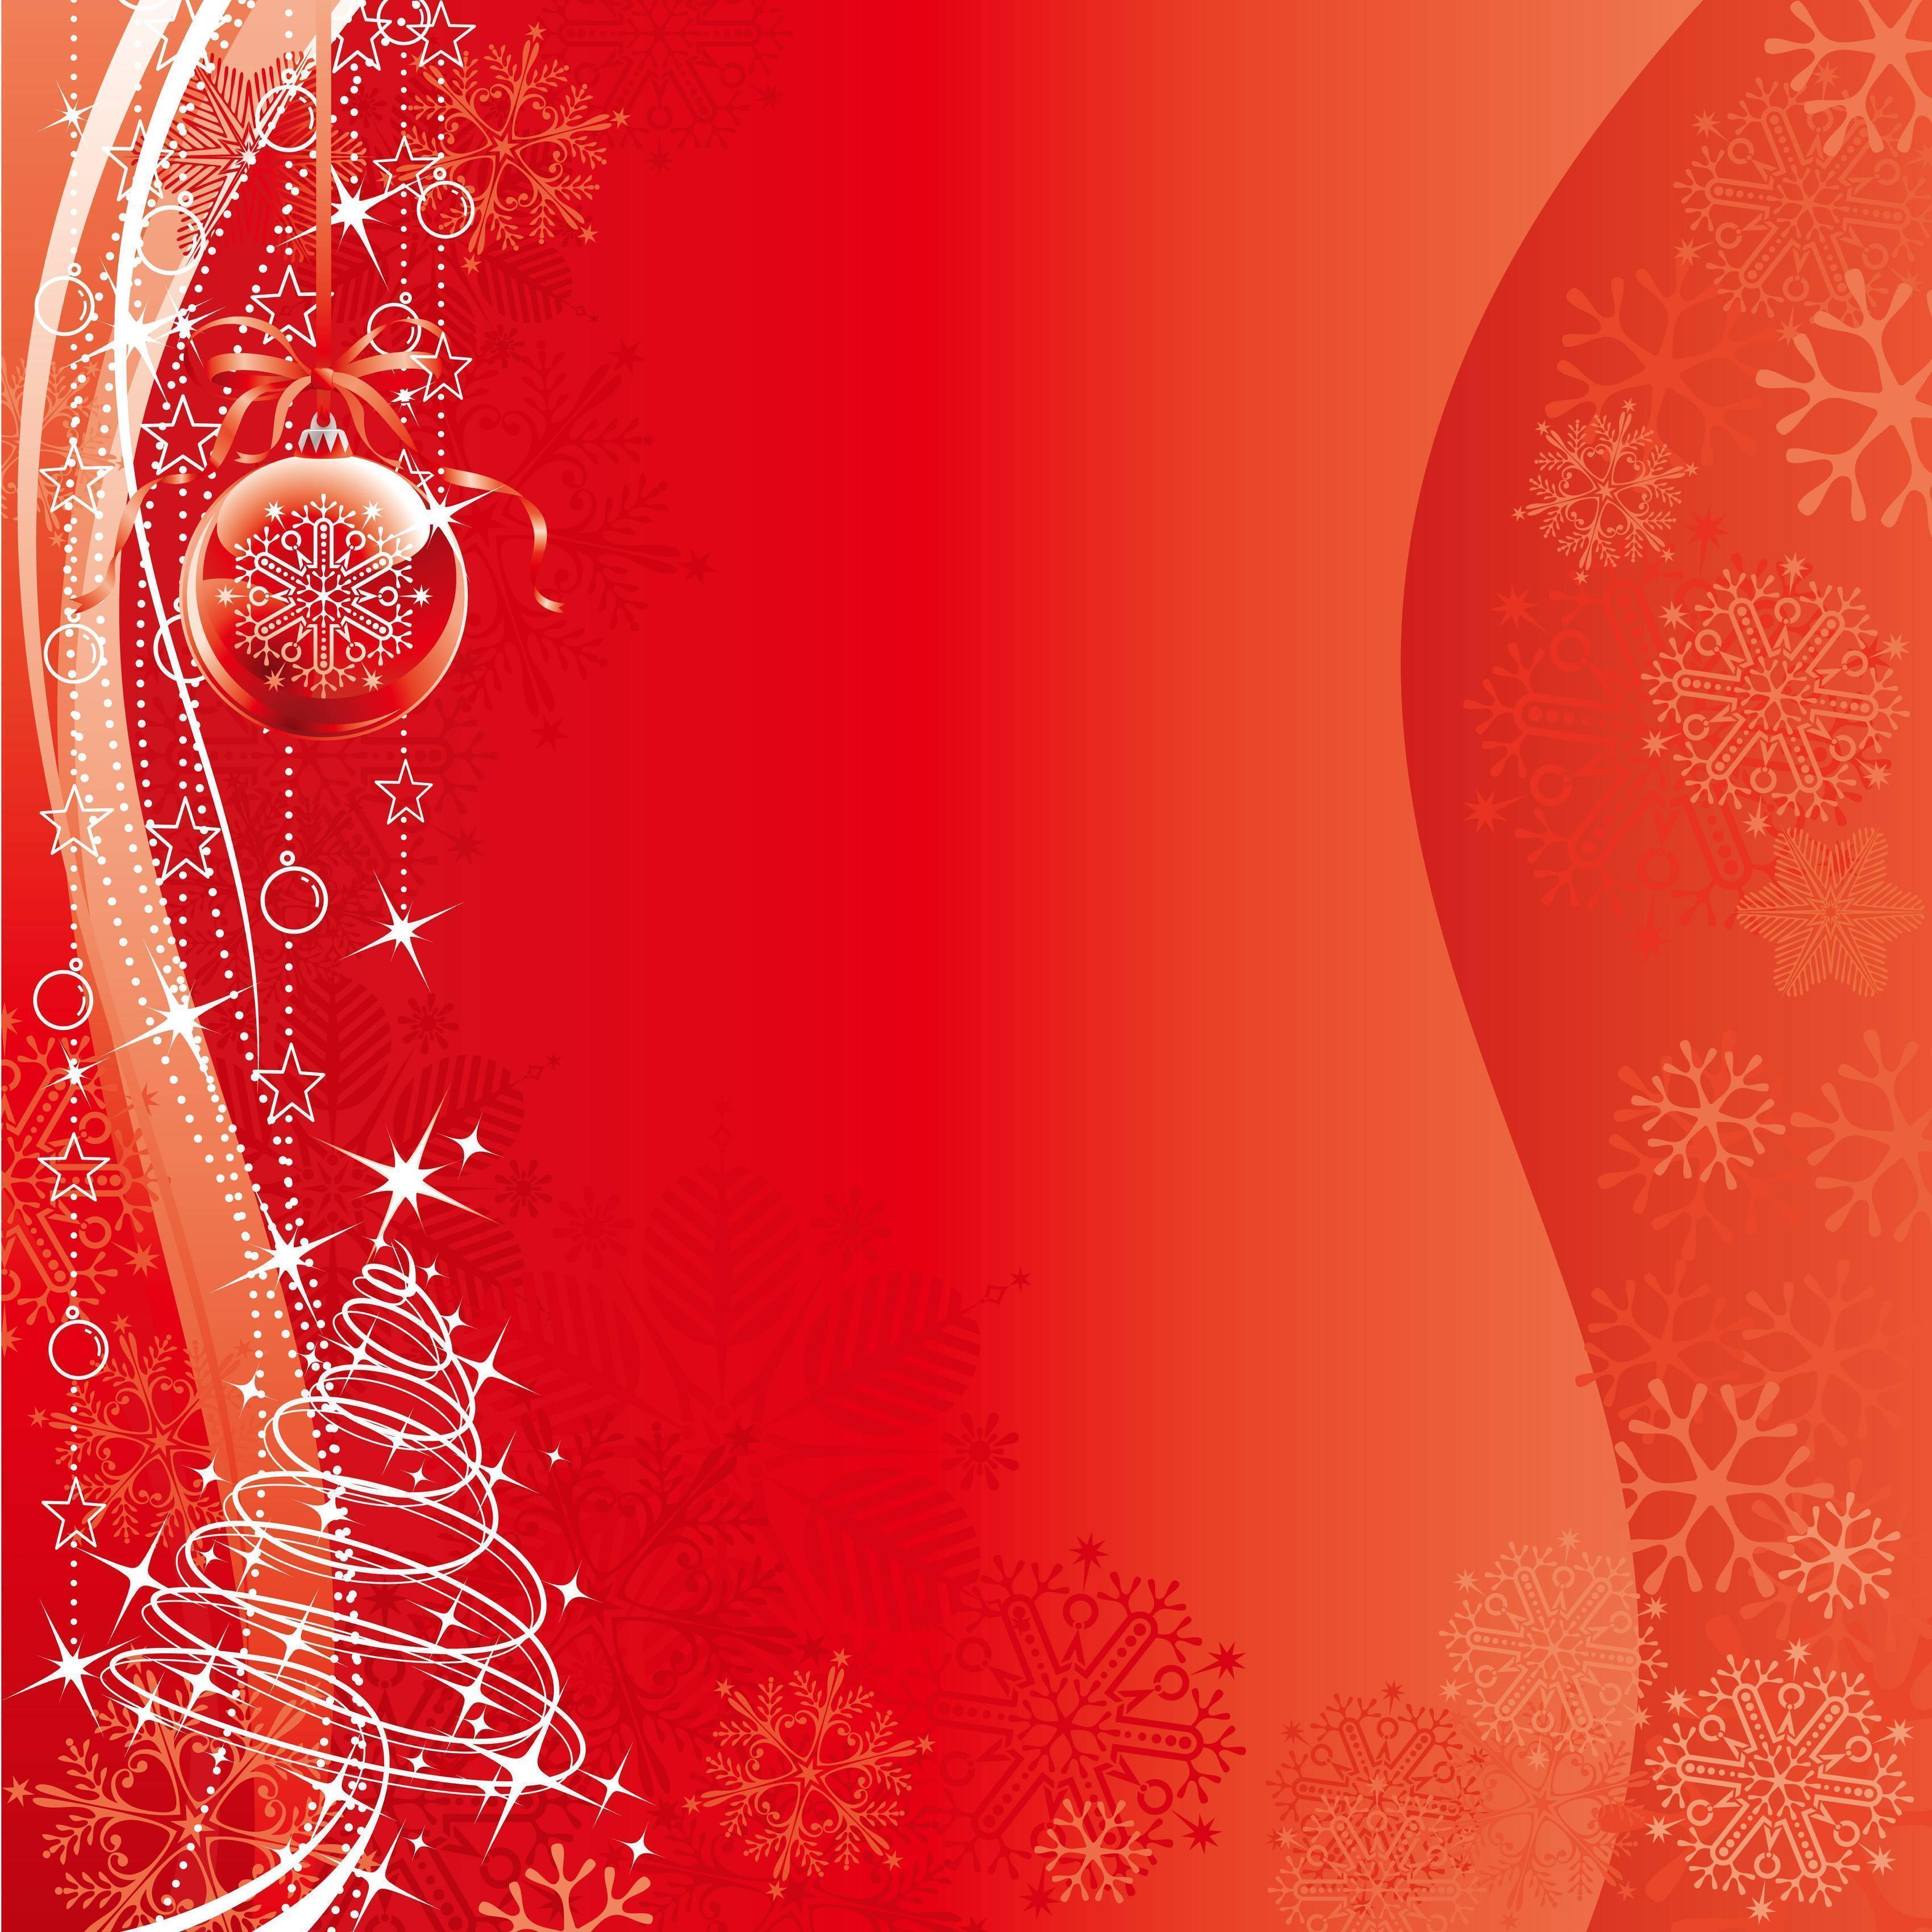 festive backgrounds image  wallpaper cave